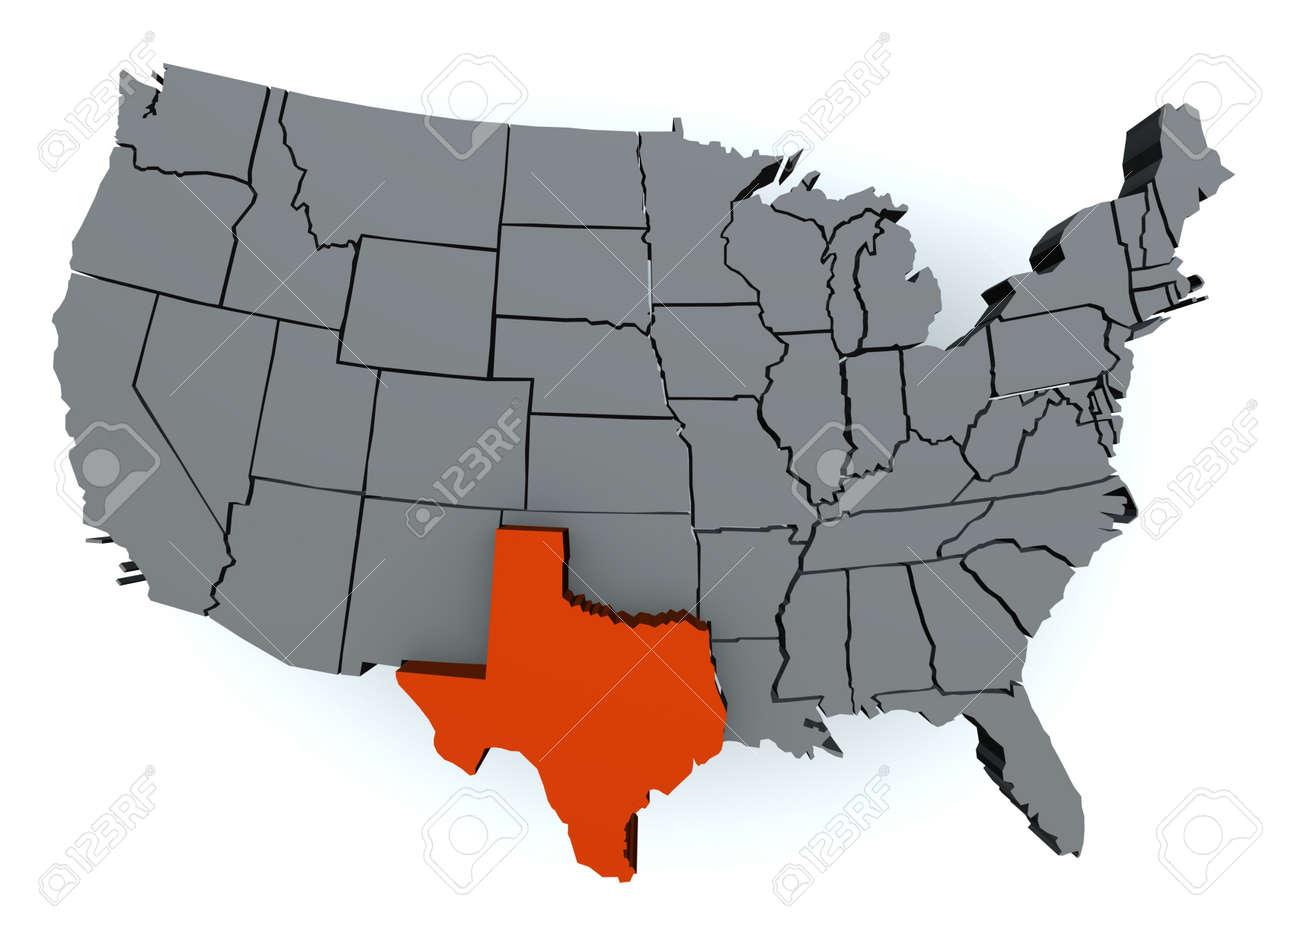 3d Map Of Texas.3d Render Of Usa Map Texas